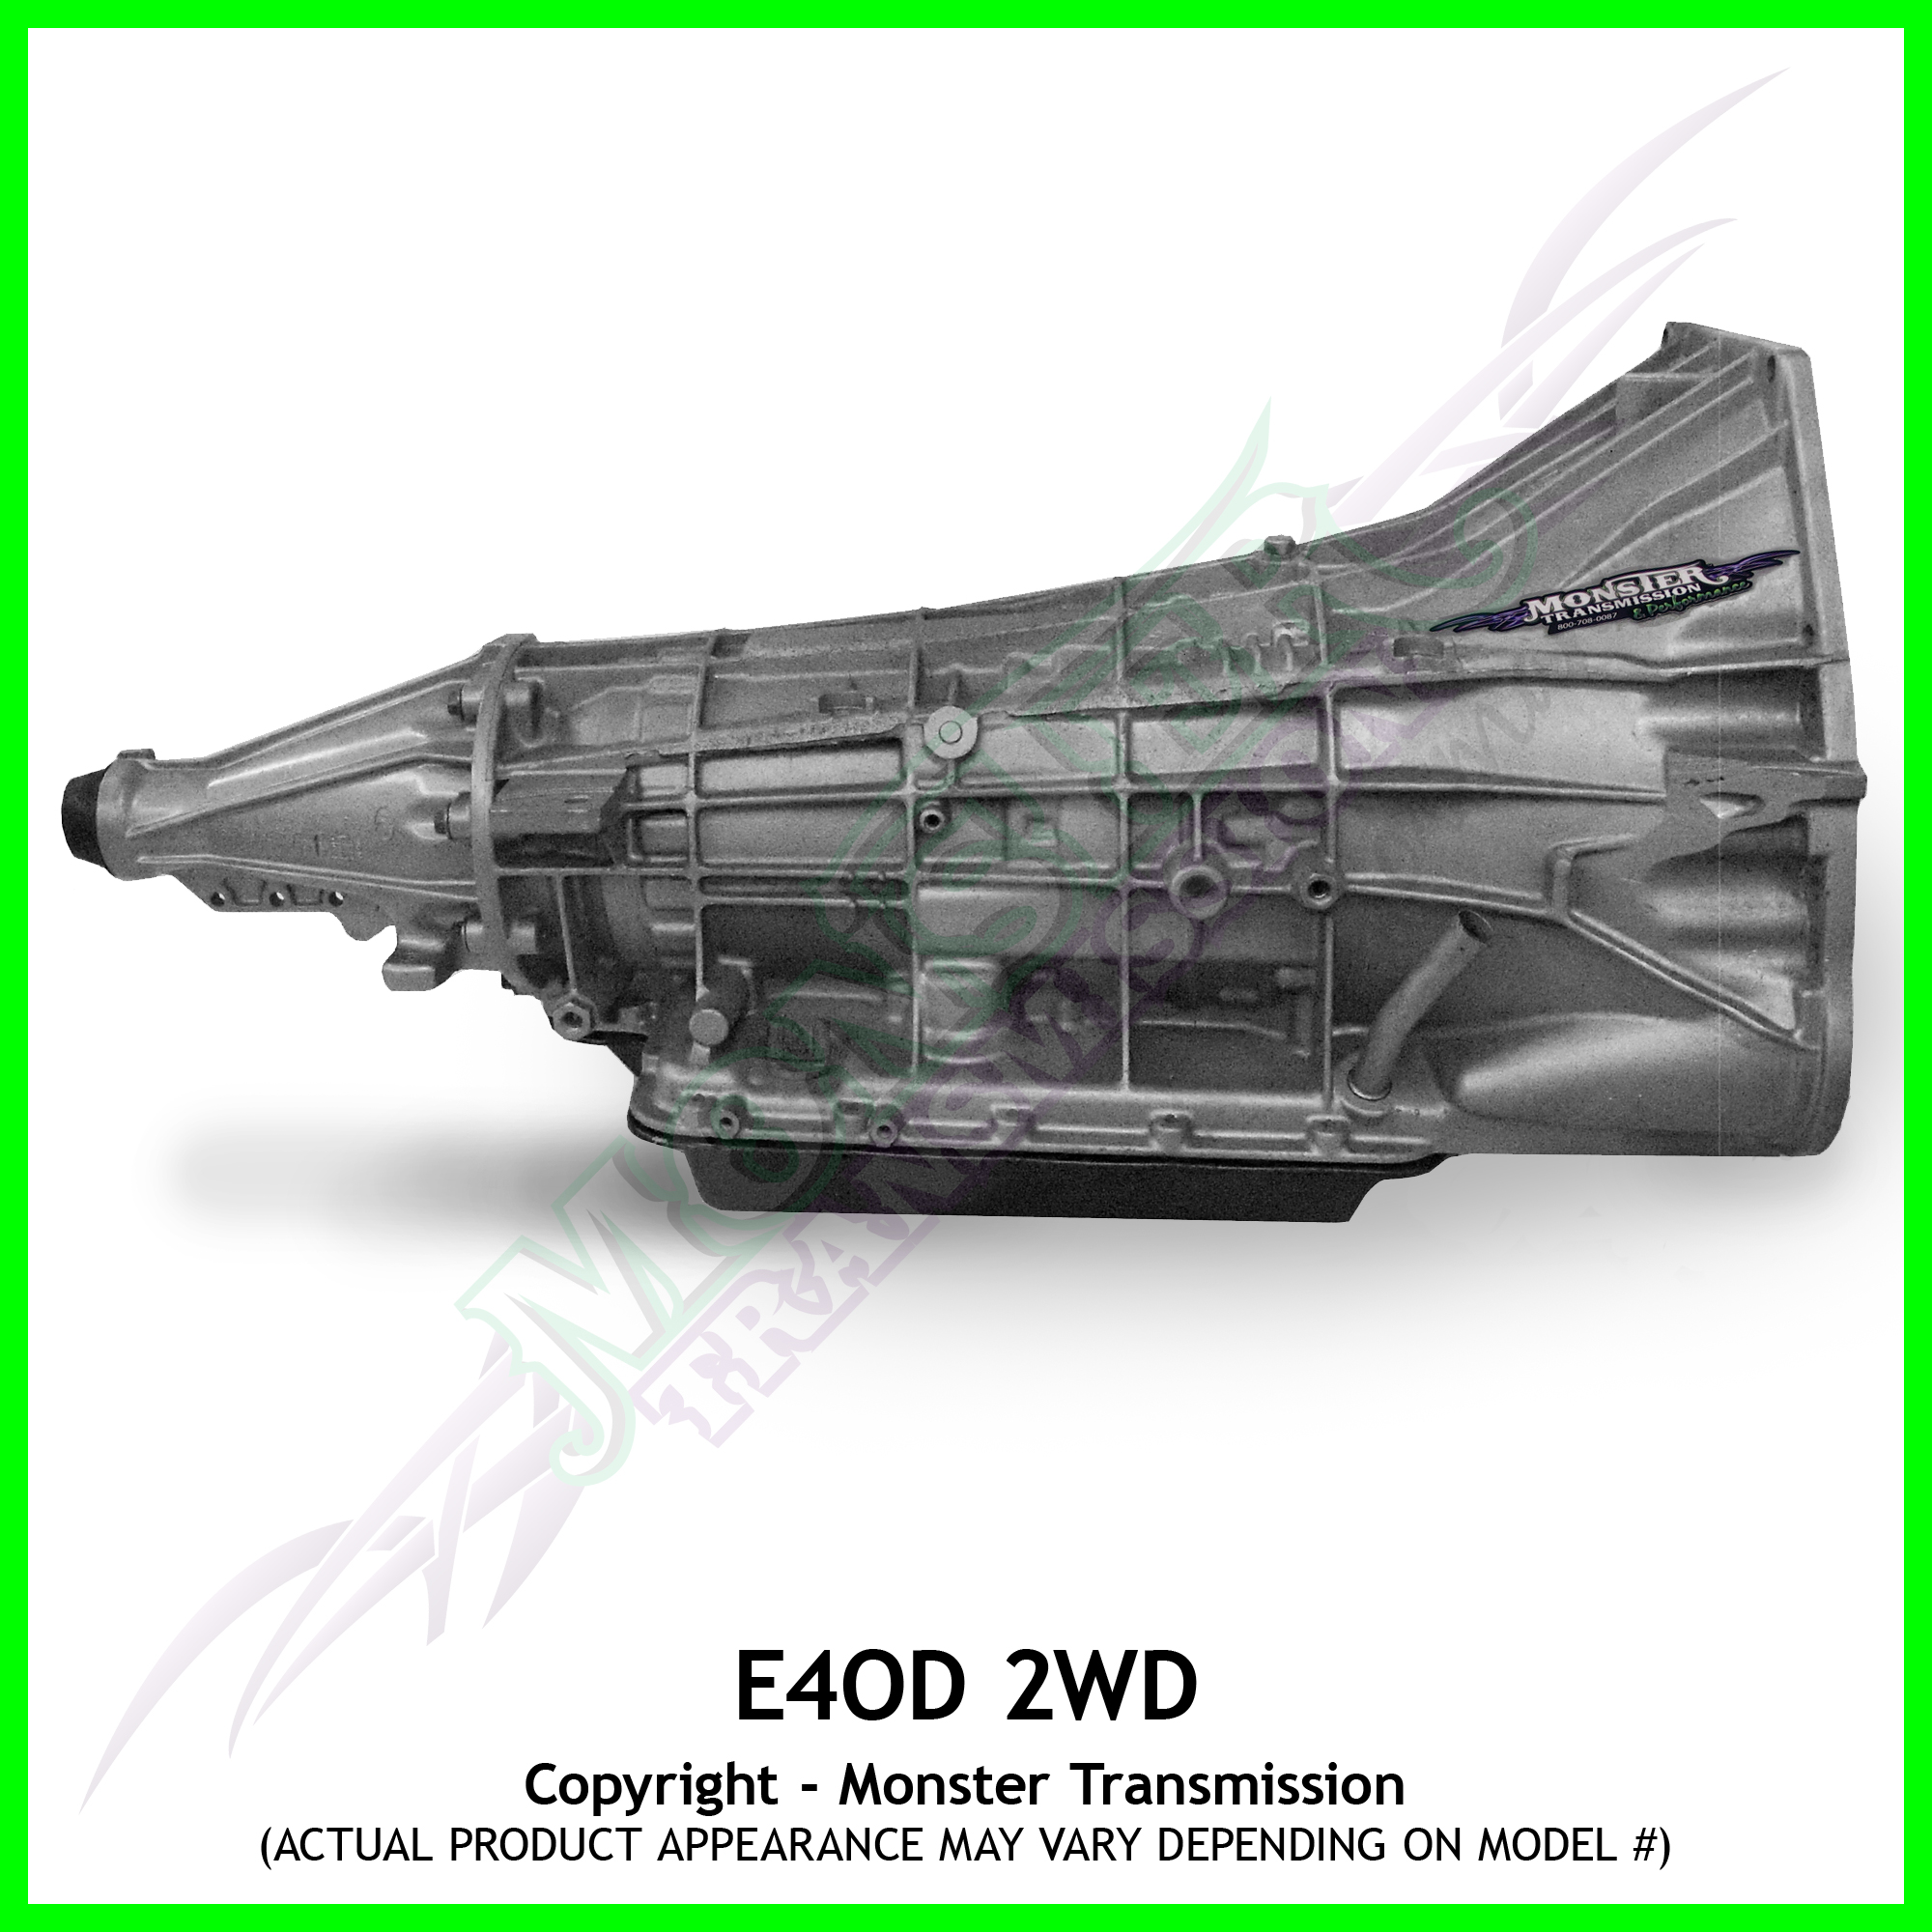 E4od Transmission Heavy Duty Gas 2wd Rebuilt. E4od Transmission Heavy Duty Gas 2wd Rebuilt Ford Truck. Ford. Sprag E40d Ford Transmission Diagram At Scoala.co